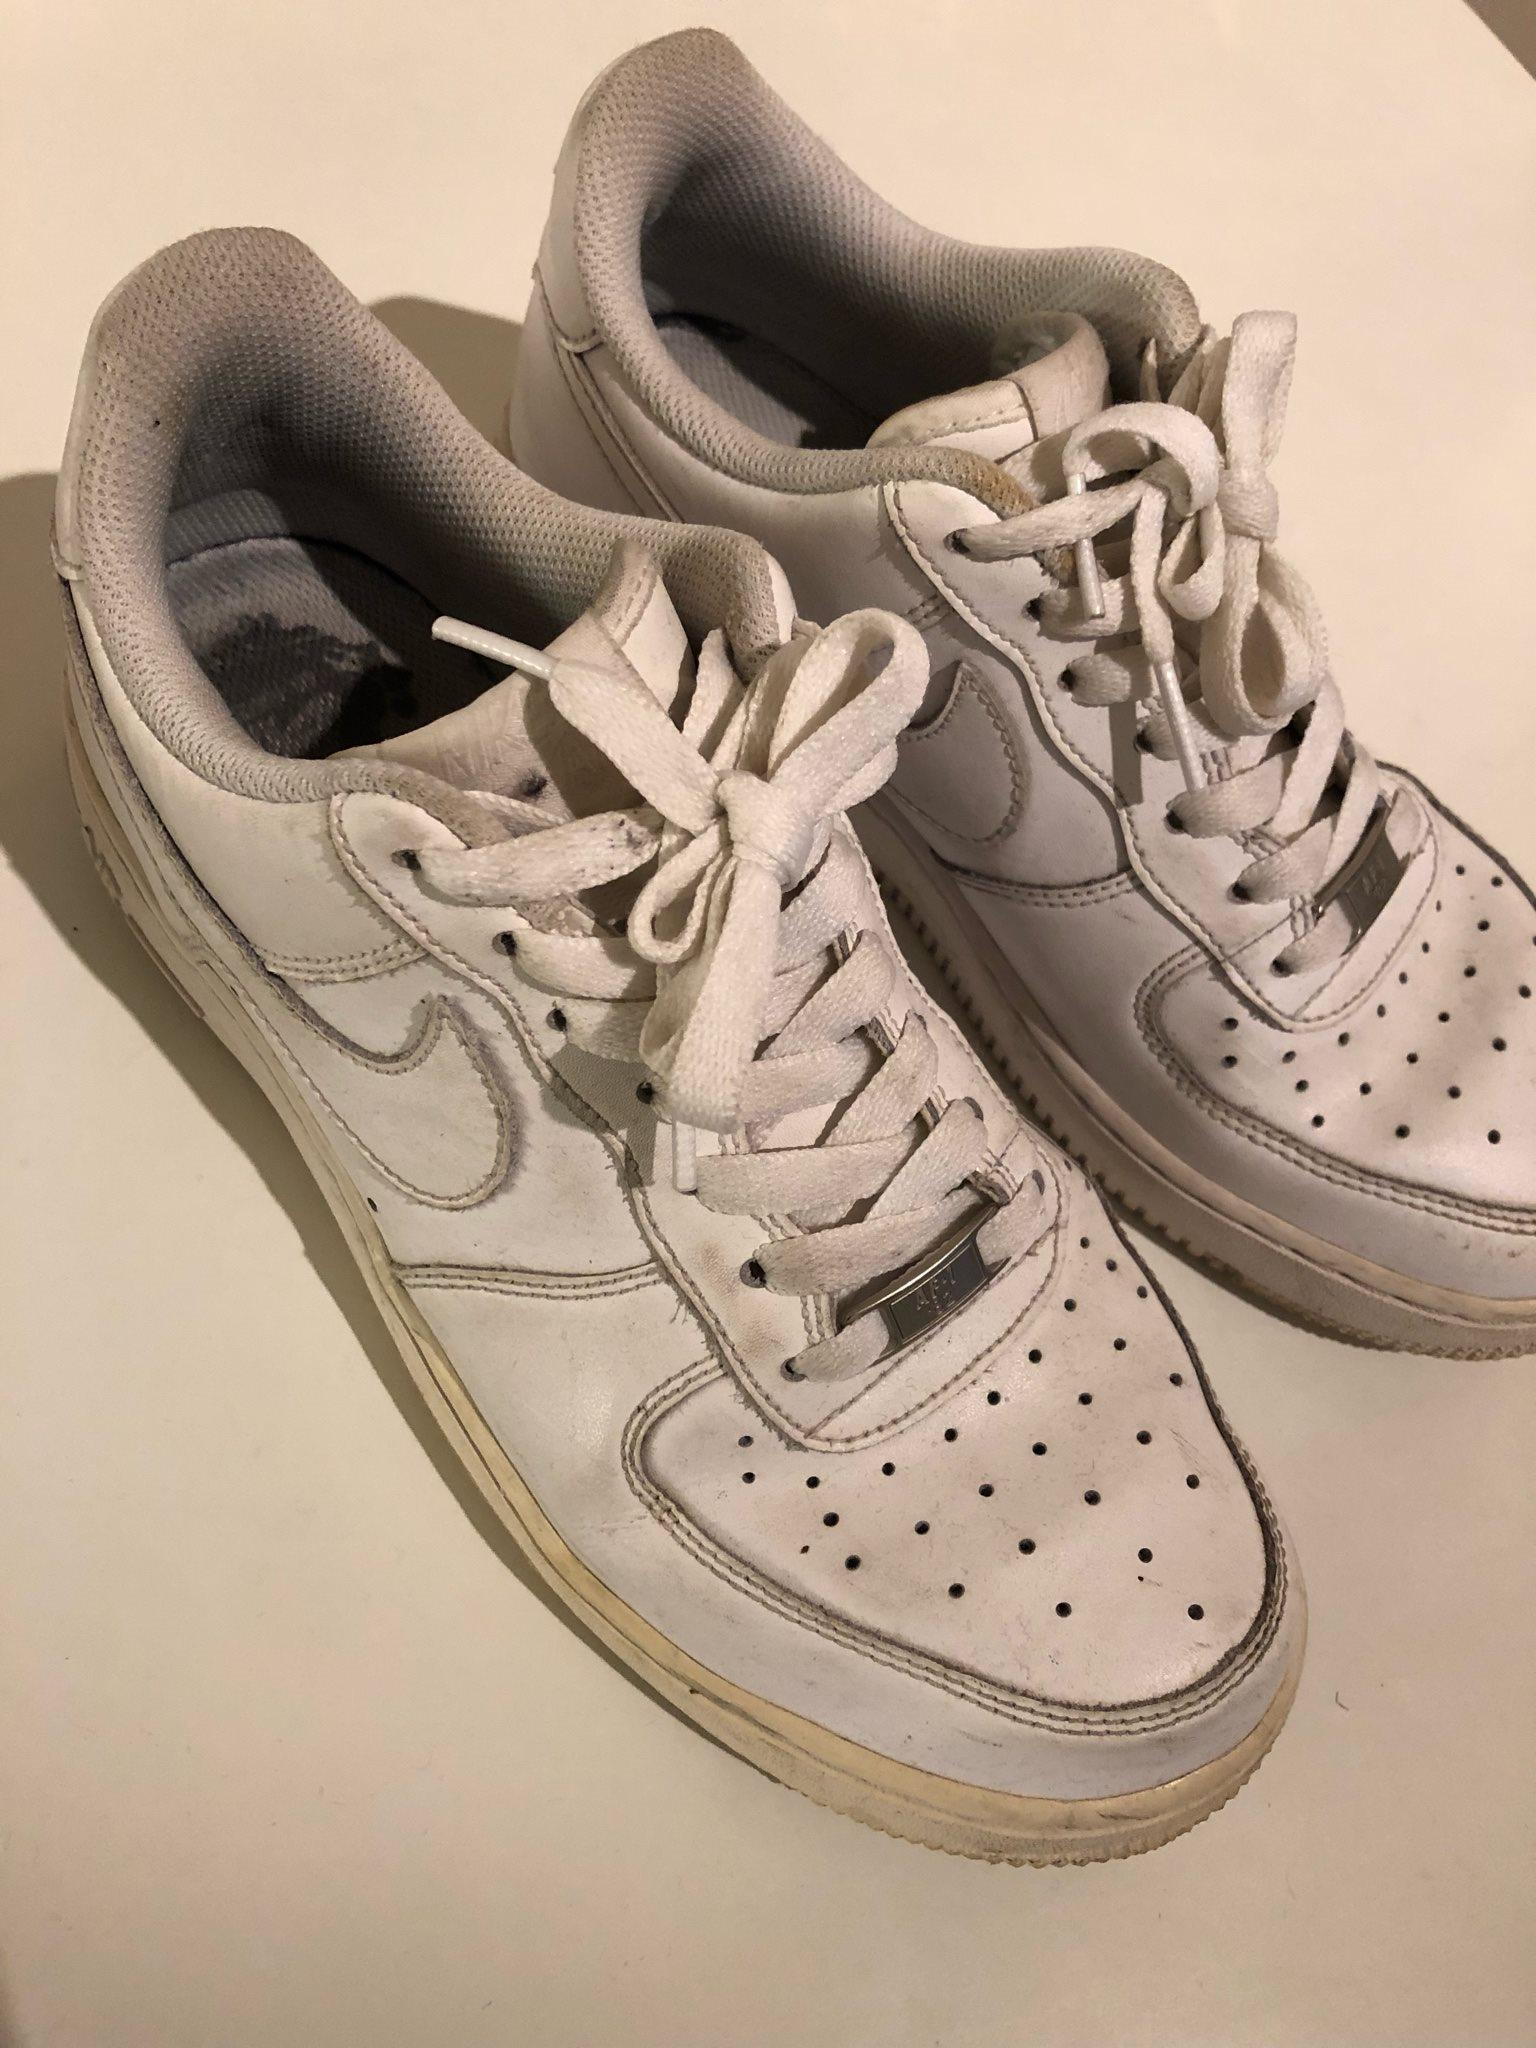 new styles 9dbf1 9a3b7 Vita Nike Air Max sneakers, storlek 40, gympaskor, dad shoes